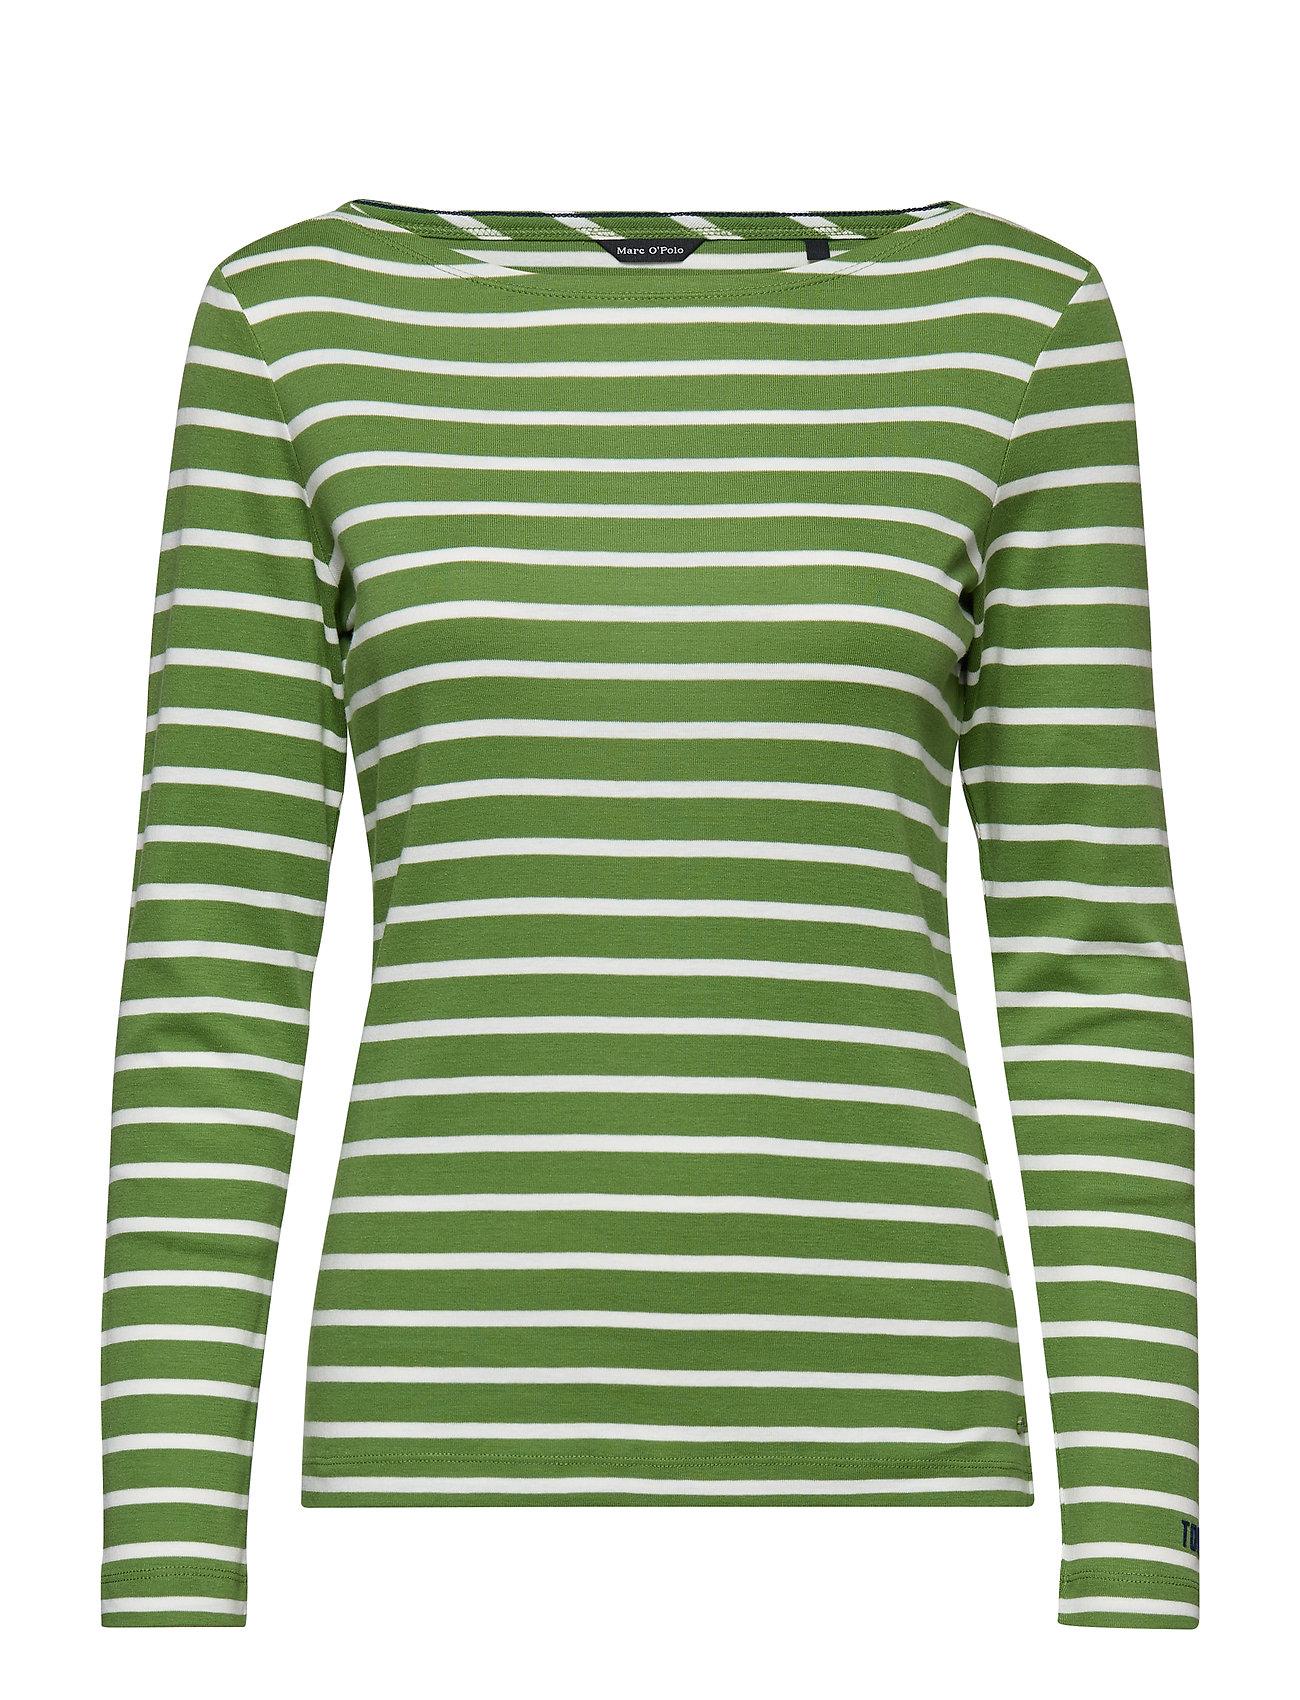 Image of T-Shirt Long Sleeve Langærmet T-shirt Grøn Marc O'Polo (3116343861)